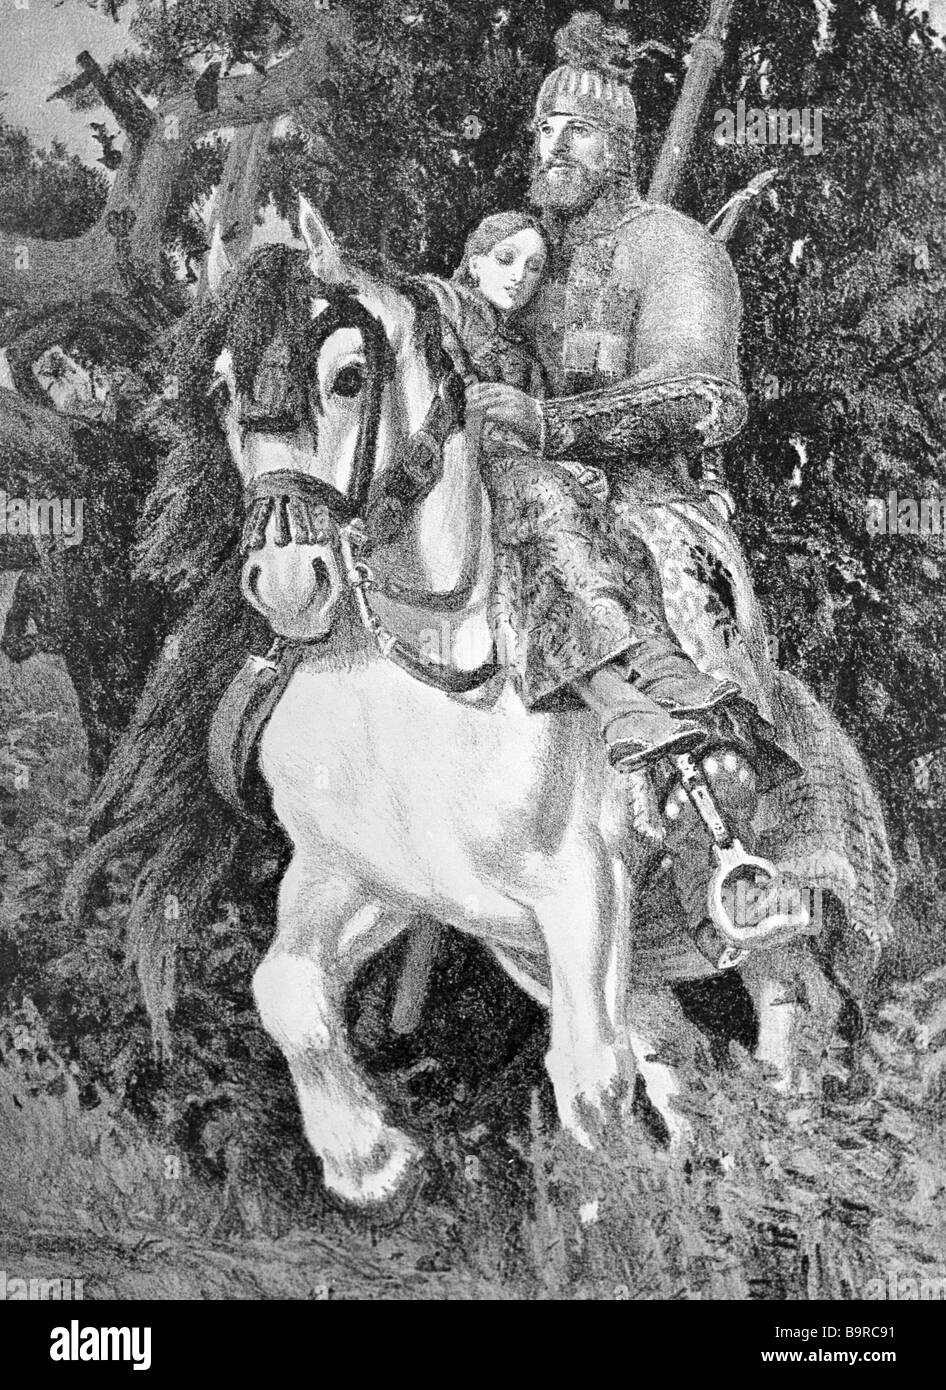 Yevgeny Kibrik An illustration to the Russian folk ballad Dobrynia and the Dragon - Stock Image